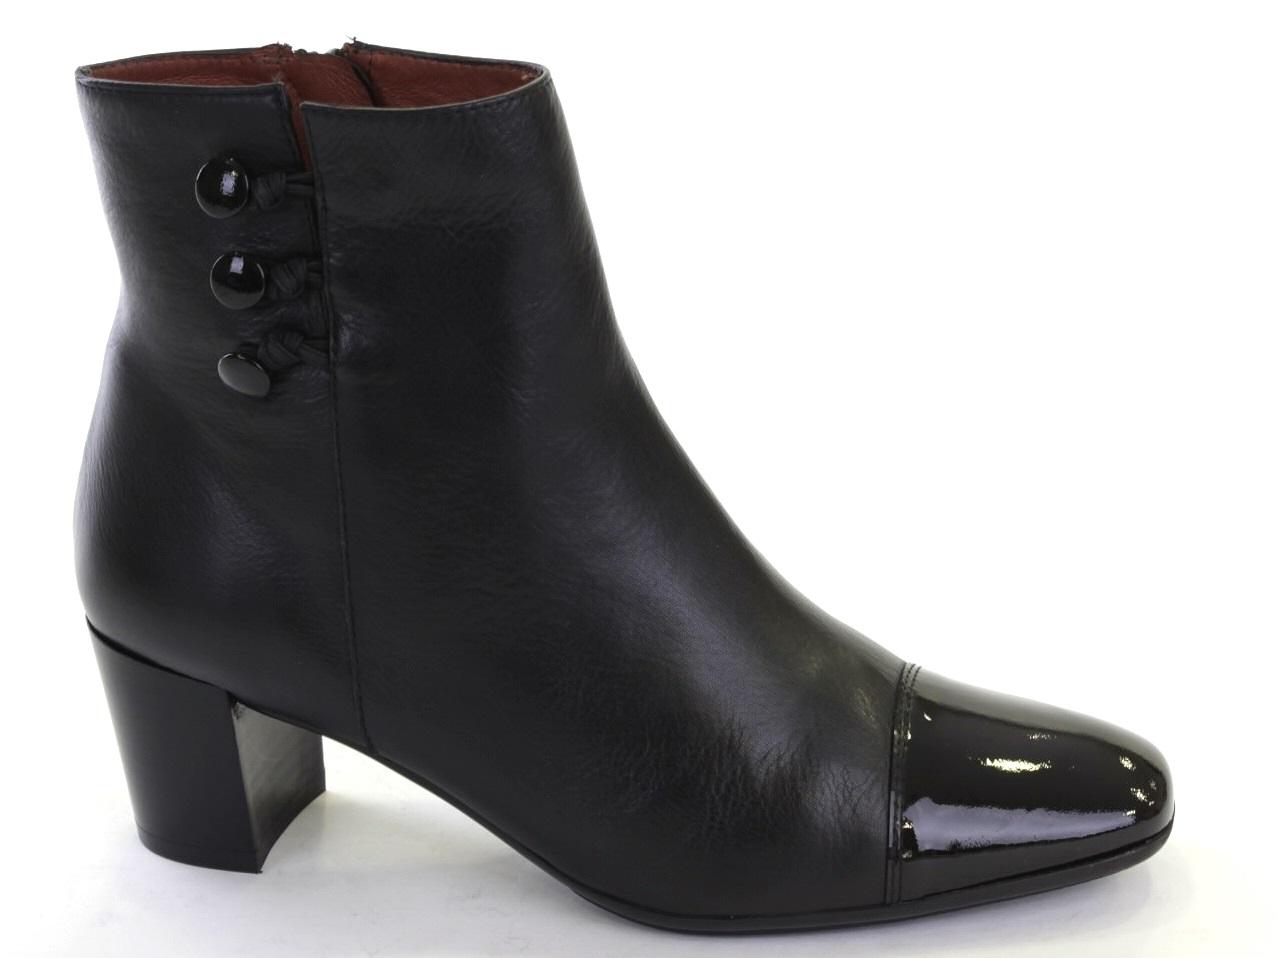 Heel Ankle Boots Hispanitas - 165 HI76211